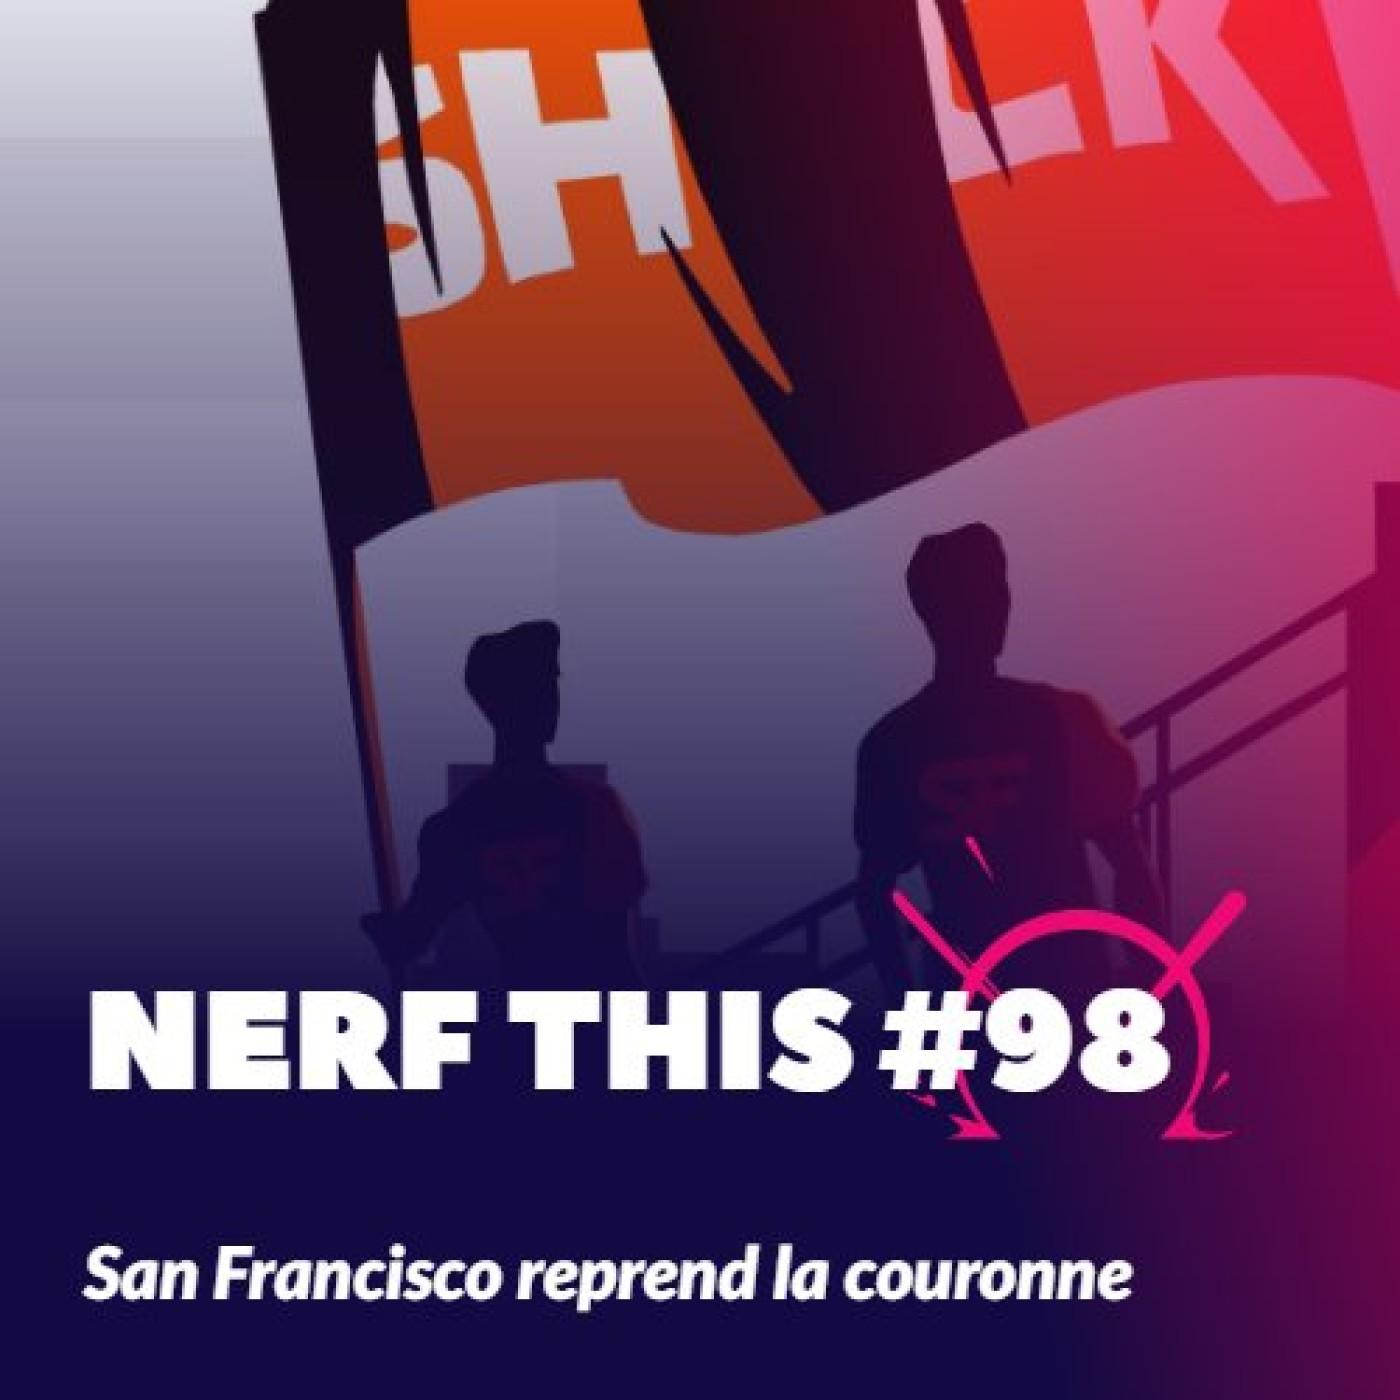 Nerf This - San Francisco reprend la couronne